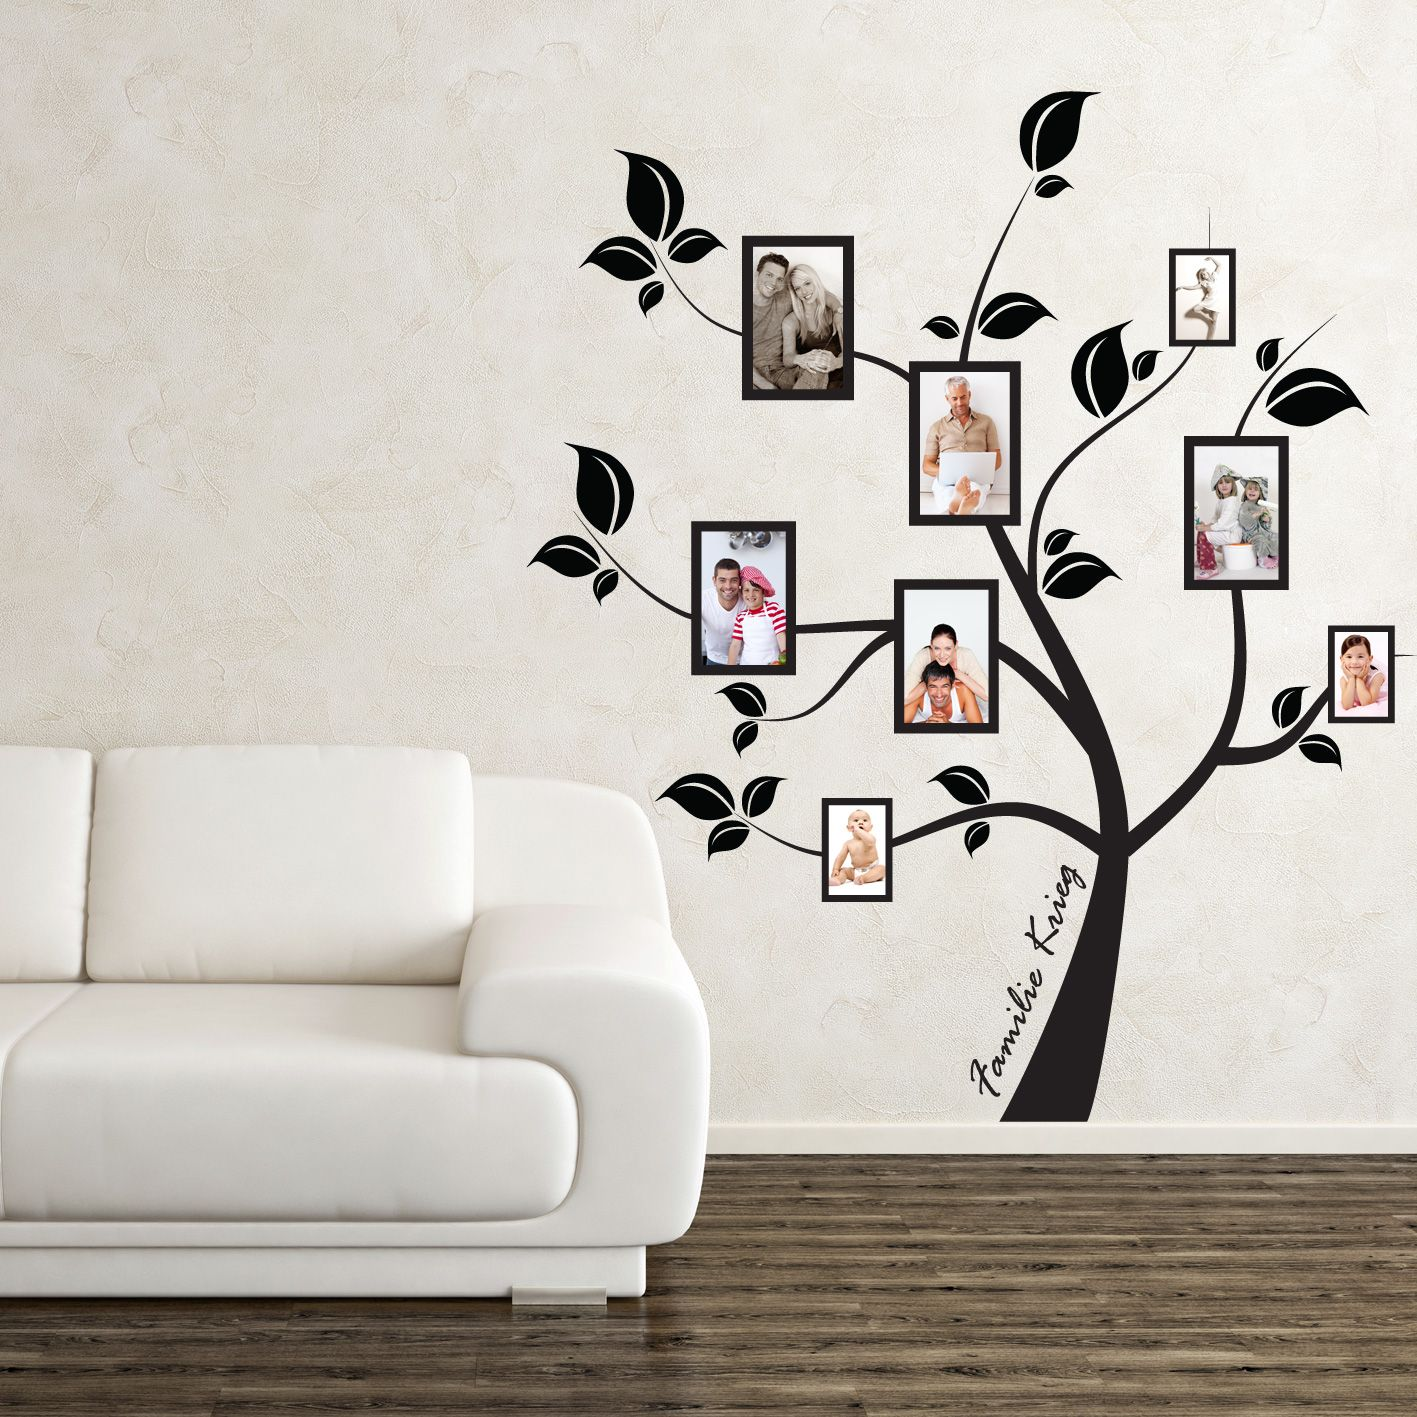 wandtattoo stammbaum reuniecollegenoetsele. Black Bedroom Furniture Sets. Home Design Ideas